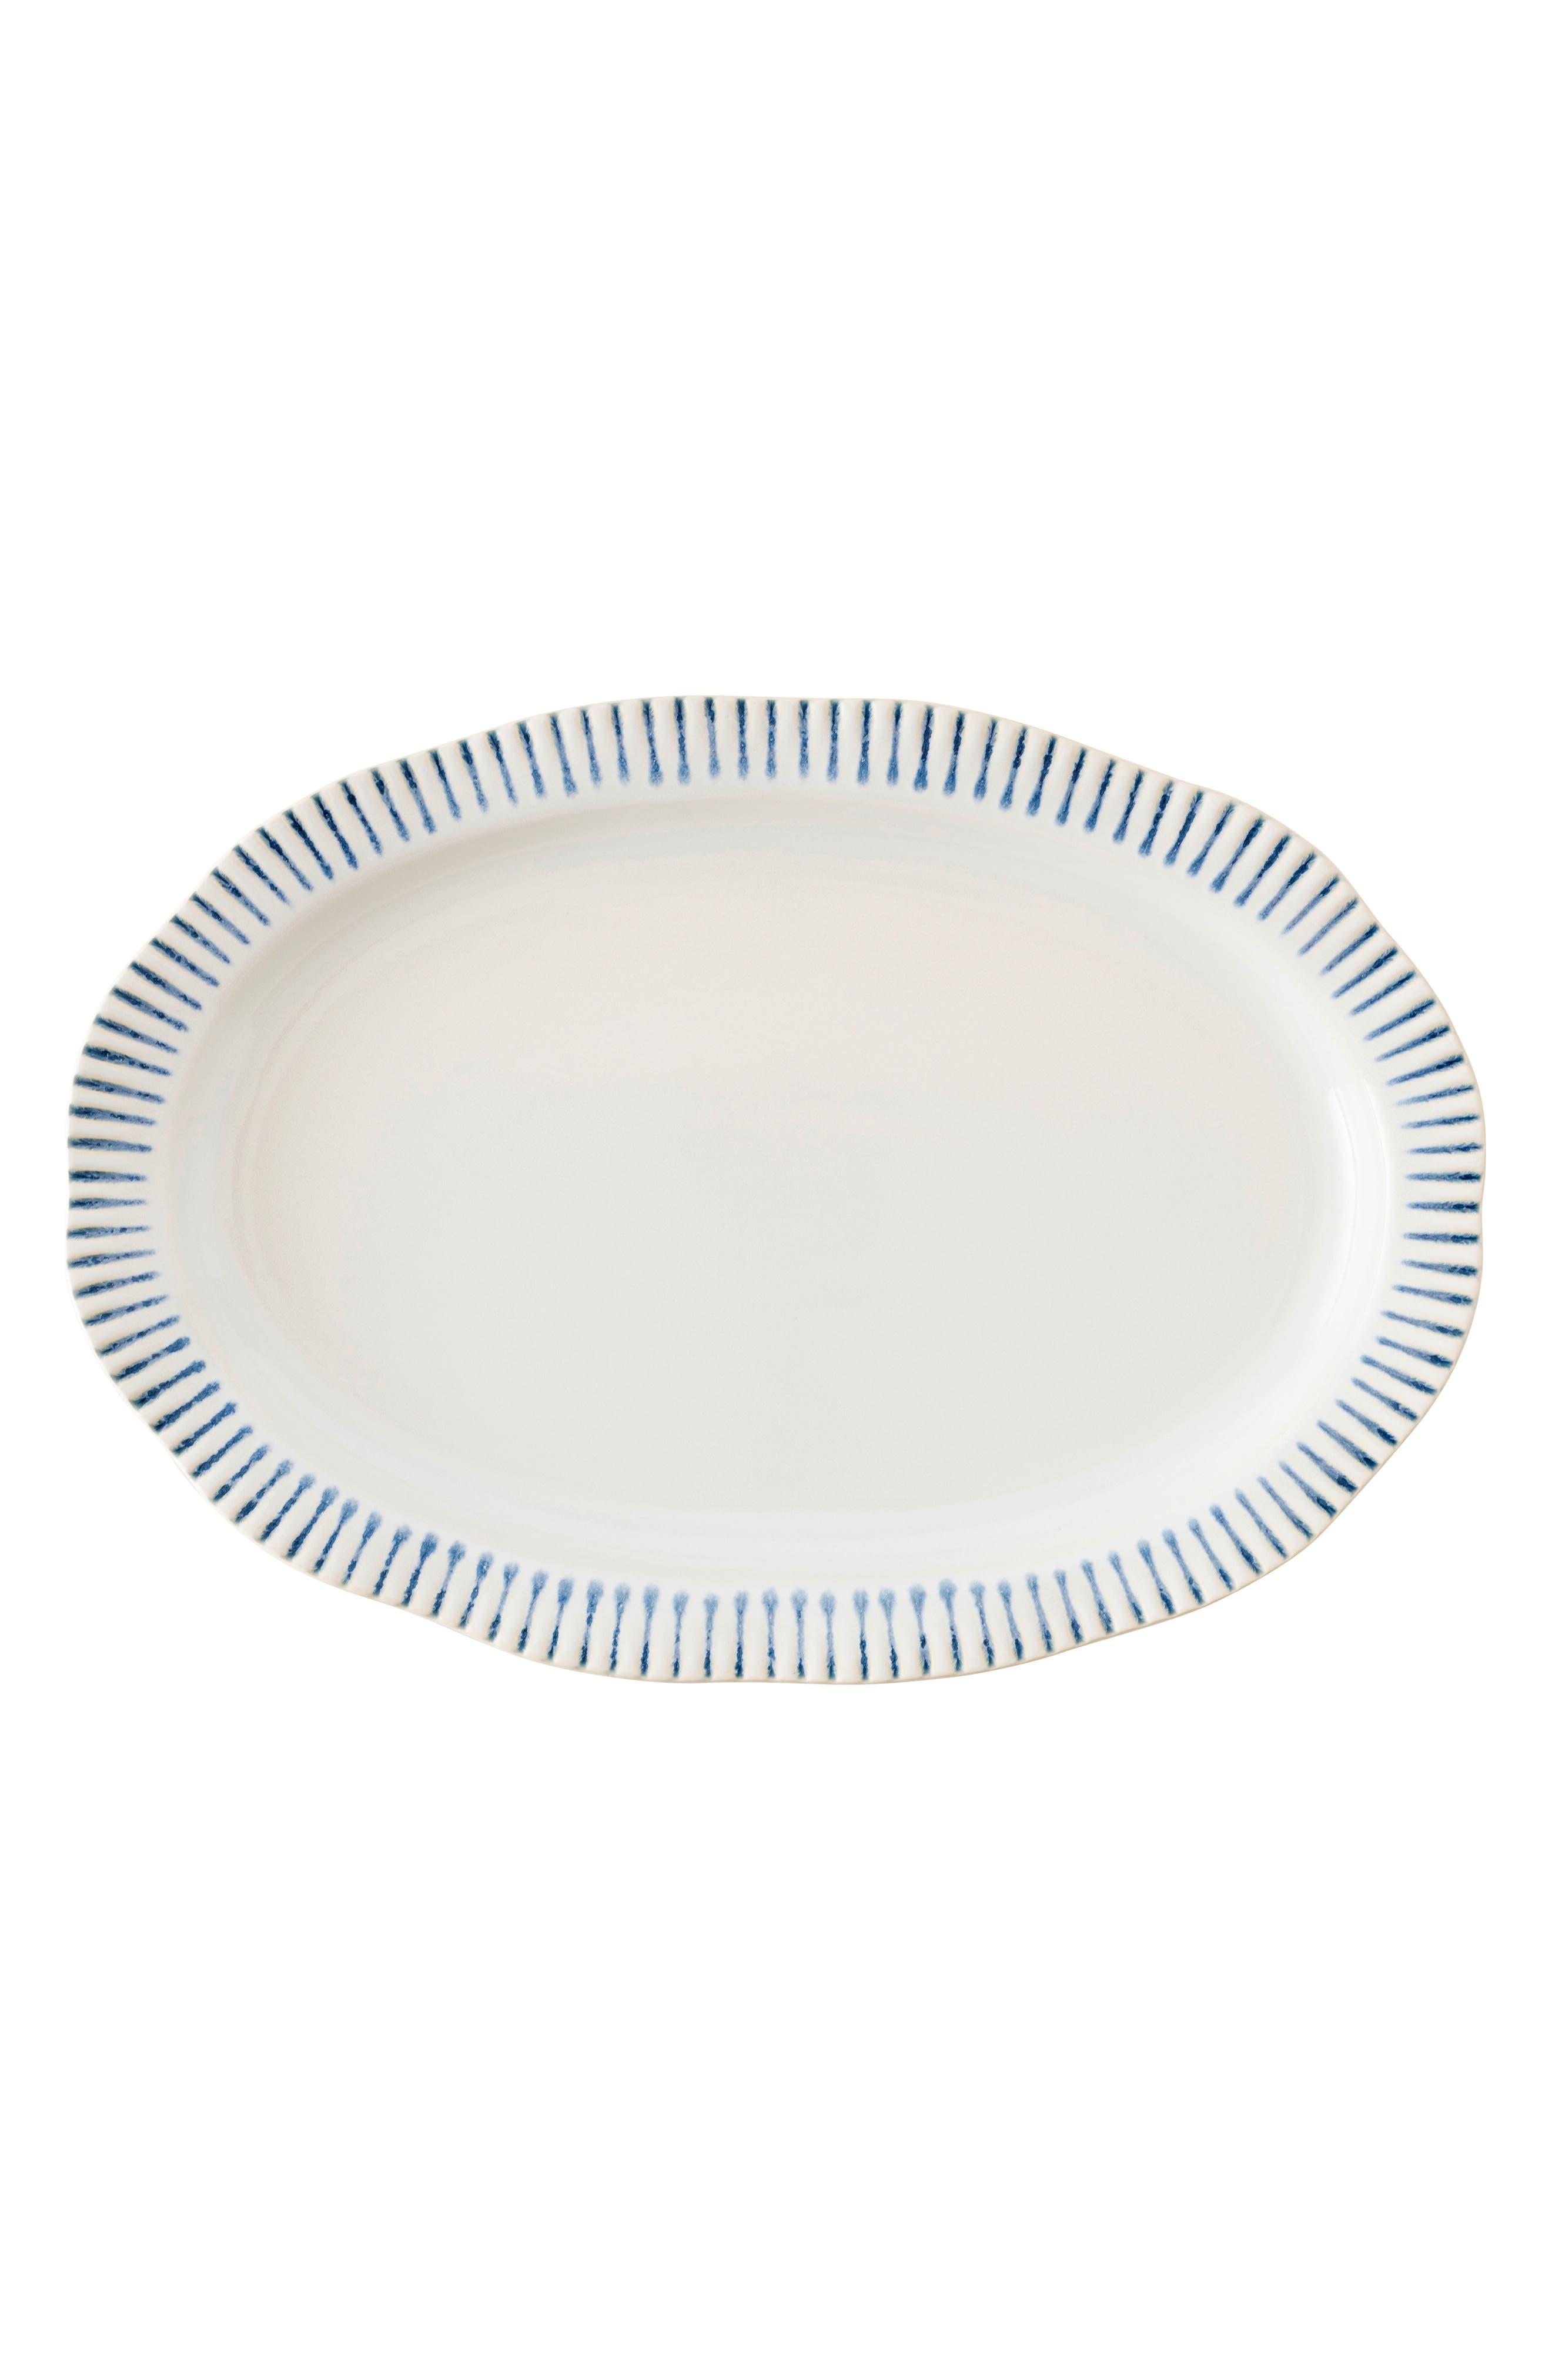 Juliska Wanderlust Collection - Sitio Stripe Stoneware Platter